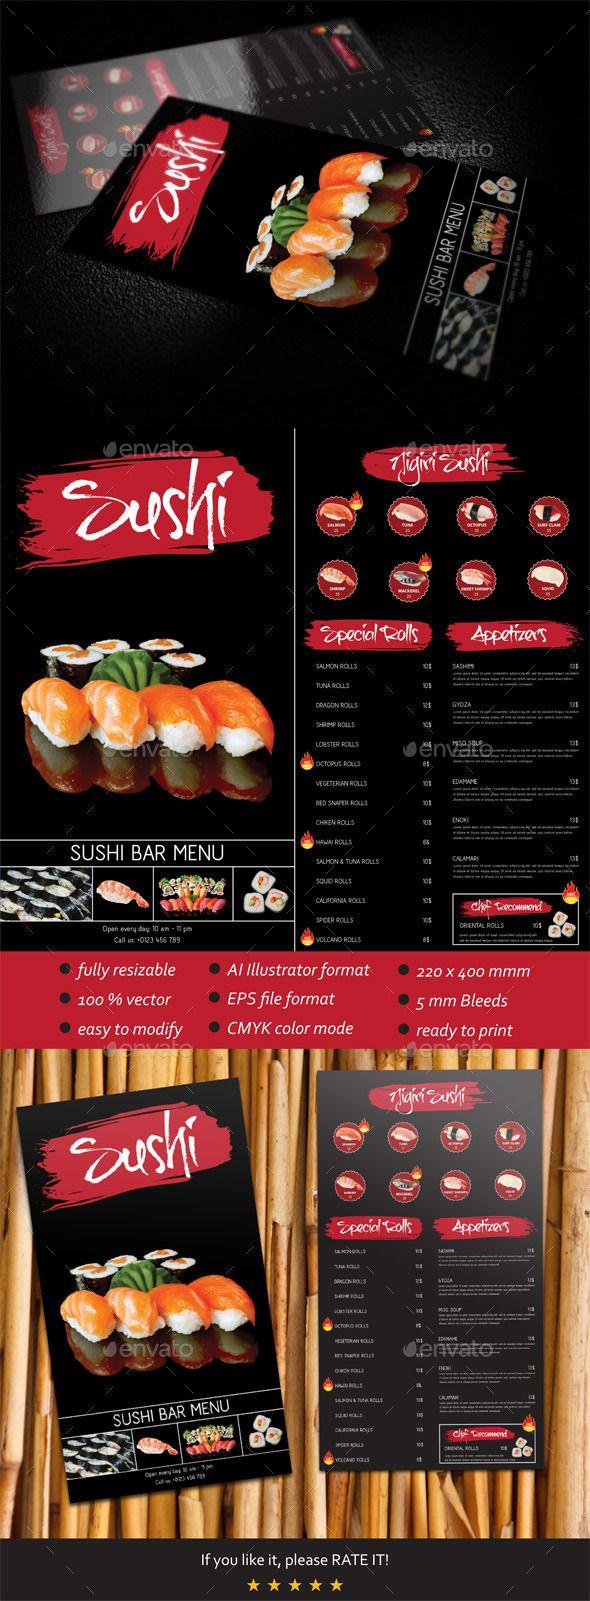 Sushi Bar Menu Template #design Download: http://graphicriver.net/item/sushi-bar-menu-template/7372303?ref=ksioks